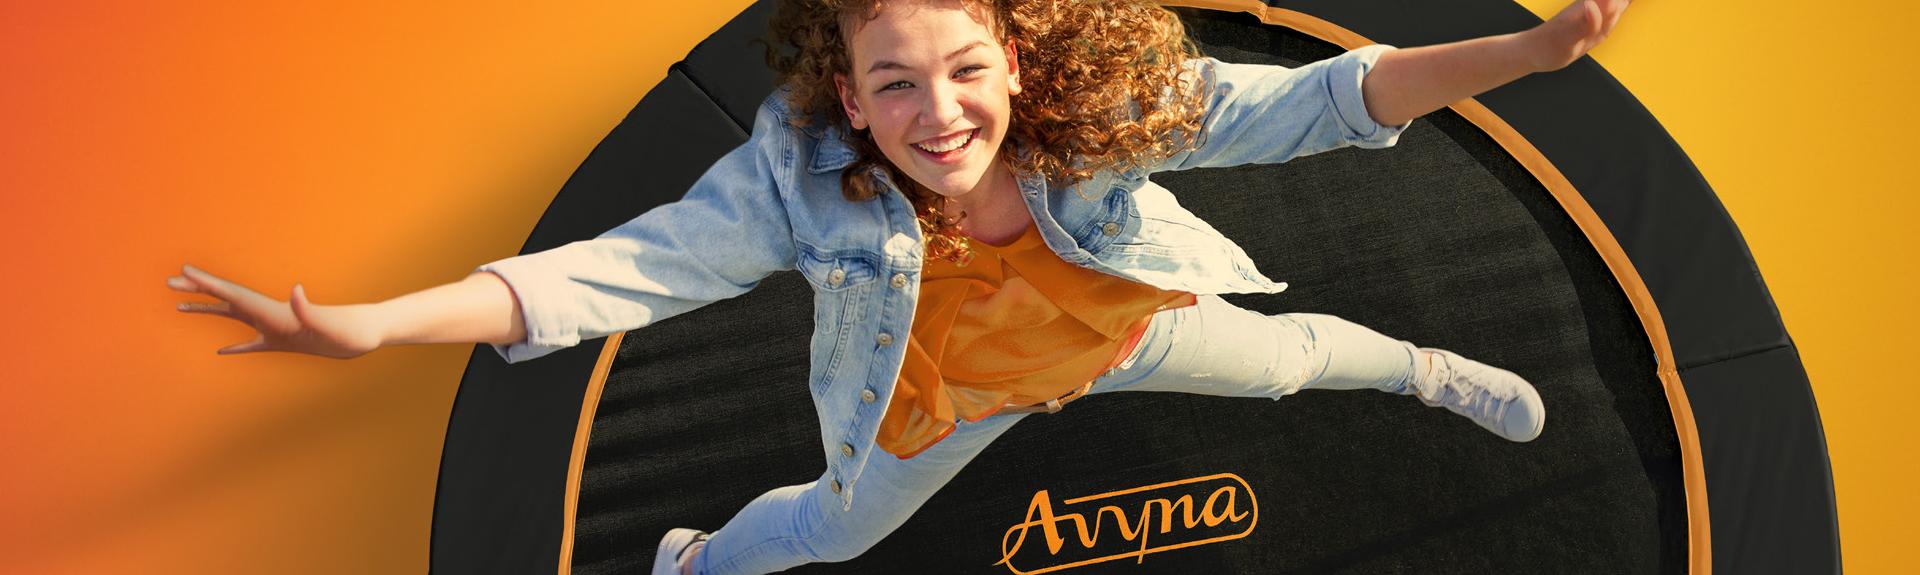 Avyna Nederland - TRAMPOLINE.NL